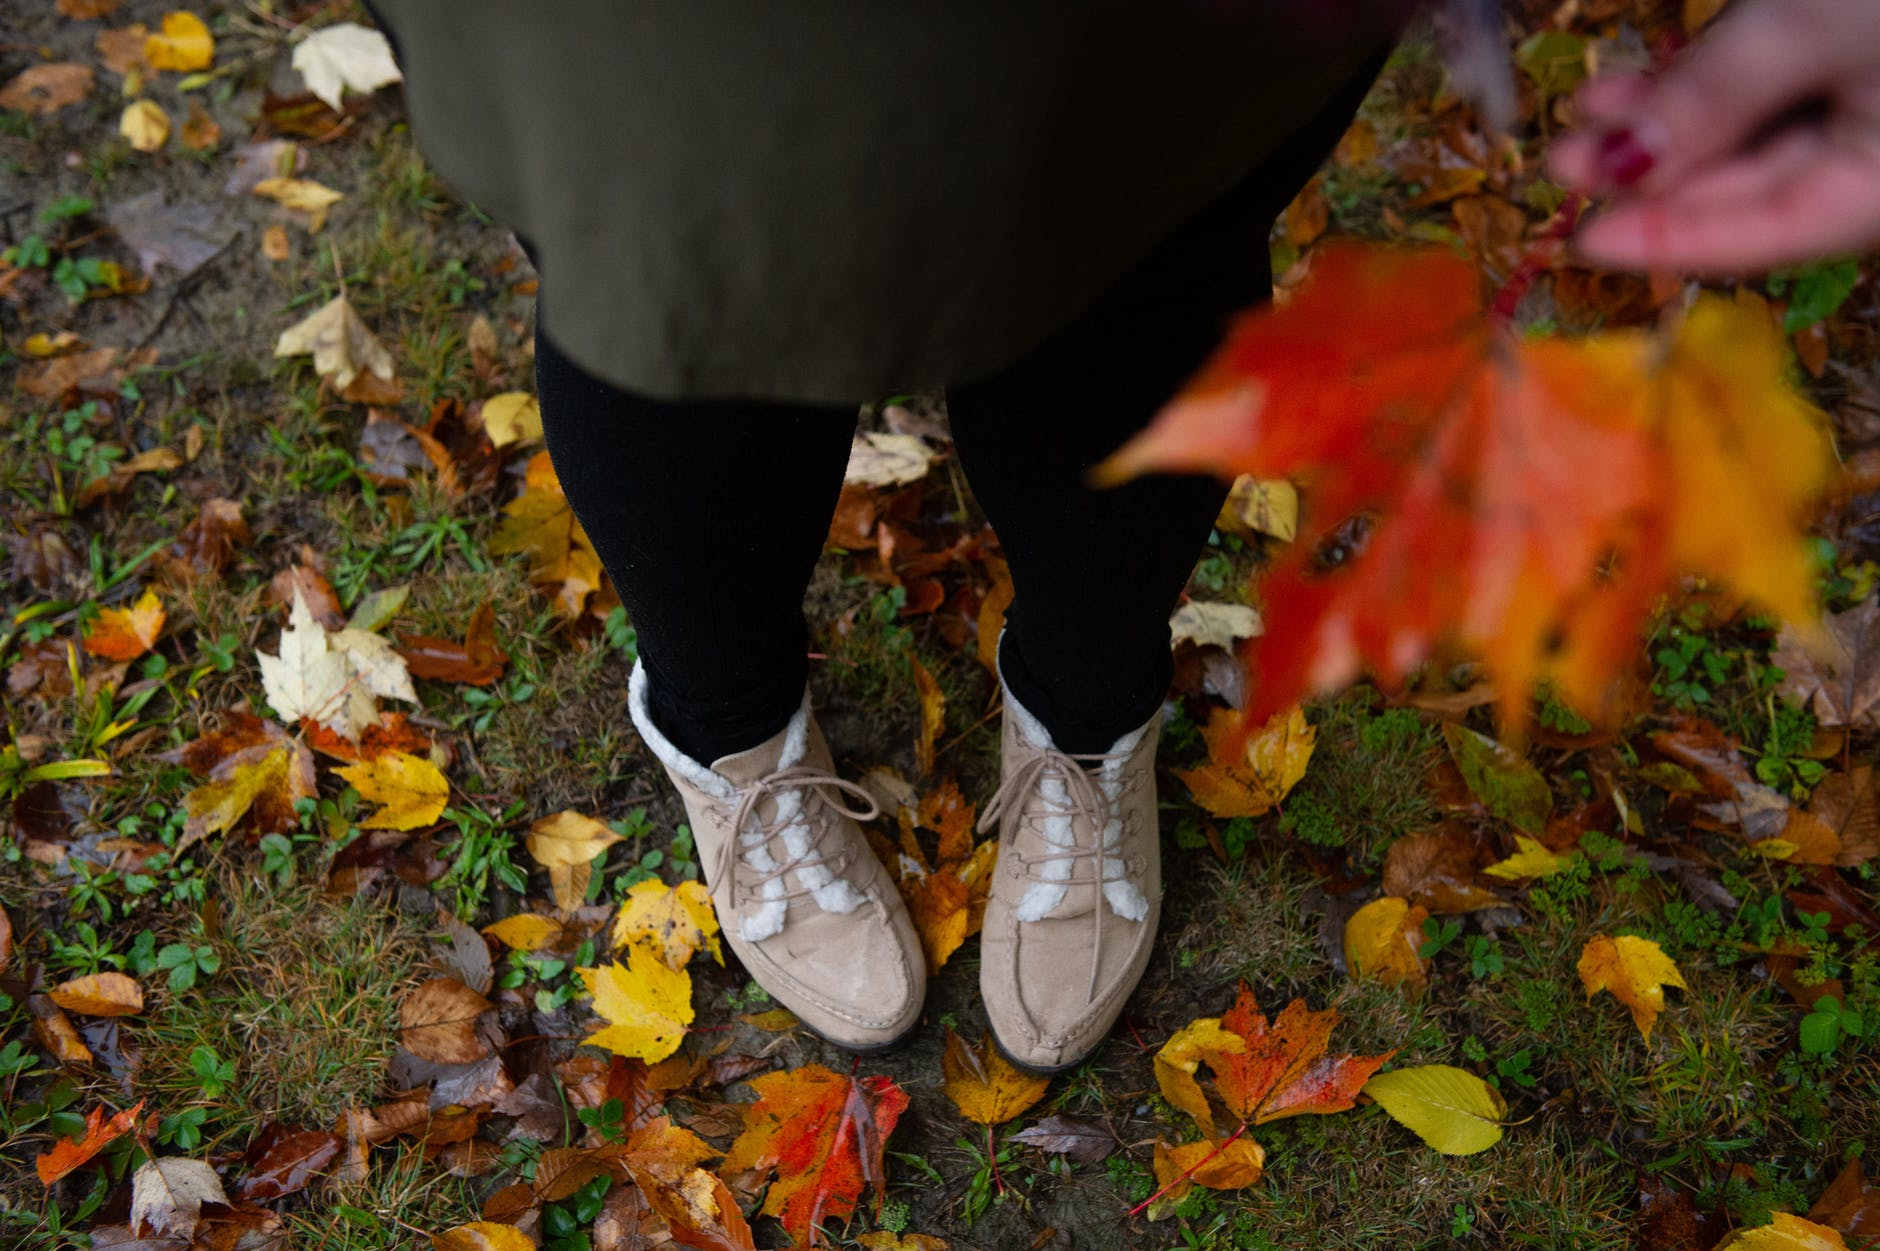 Autumn leaves illustrate Adelaide Crapsey's November-themed cinquain